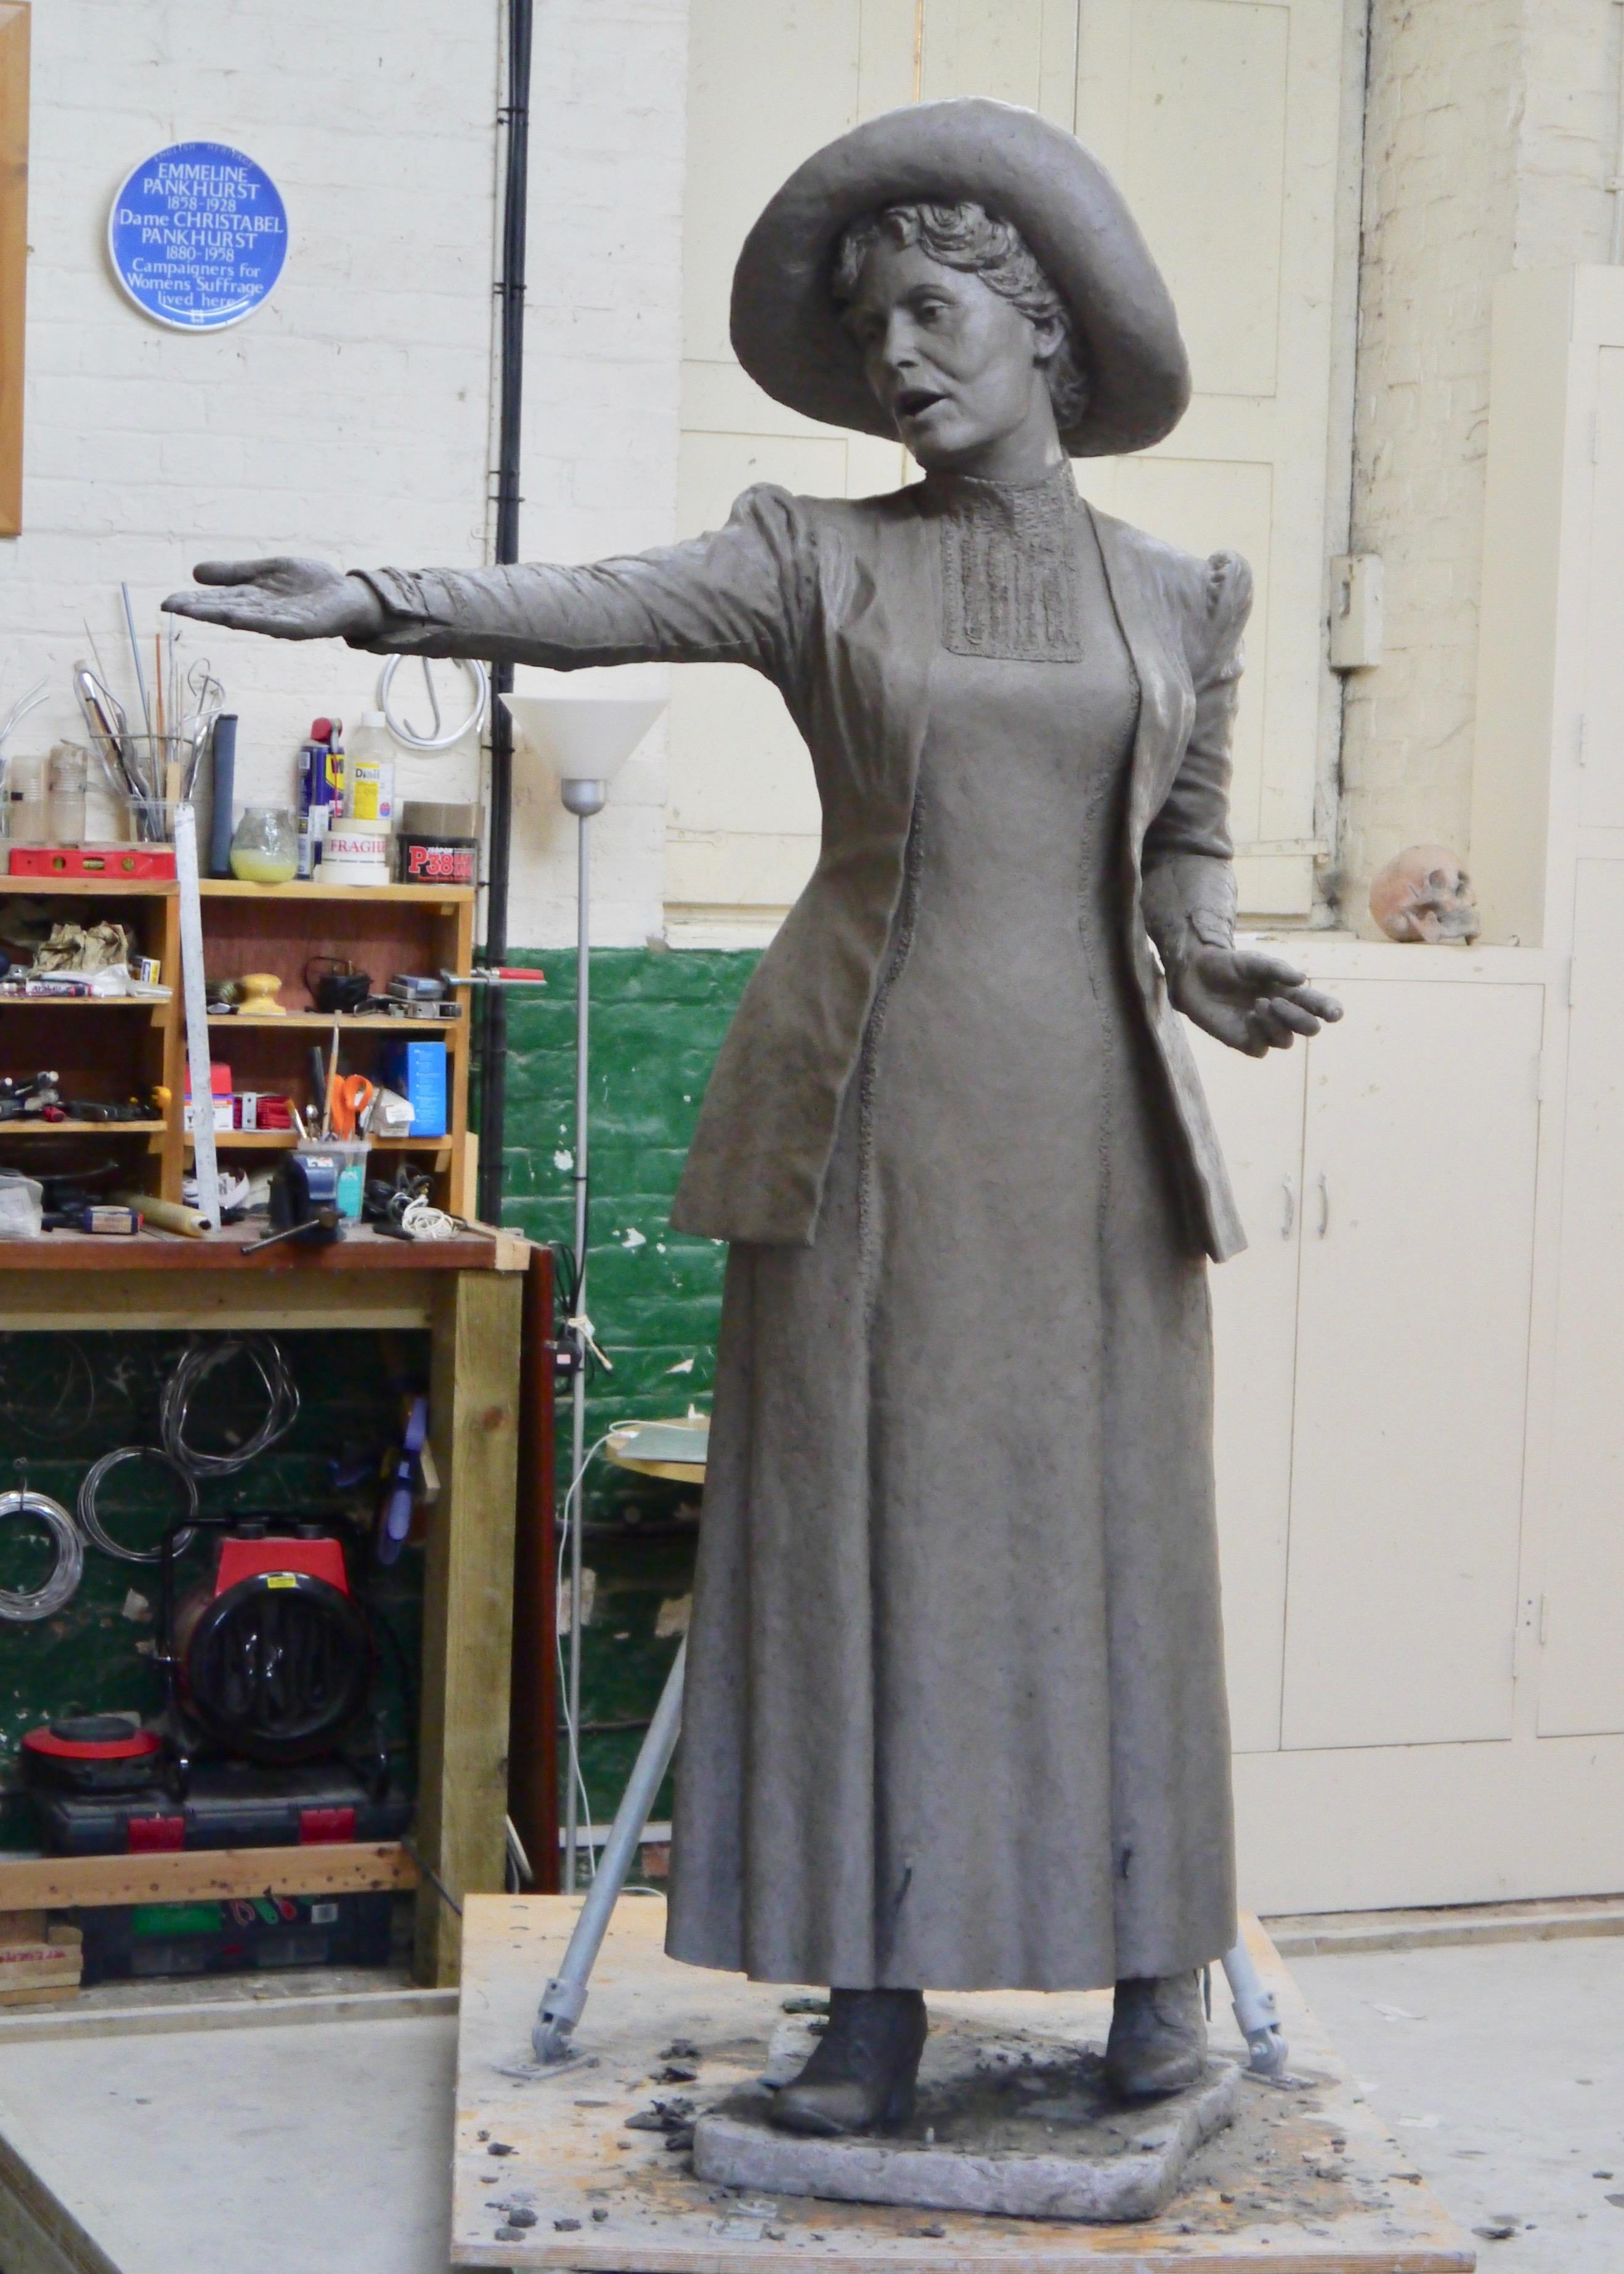 Final clay of Emmeline Pankhurst by Hazel Reeves, photo by Hazel Reeves